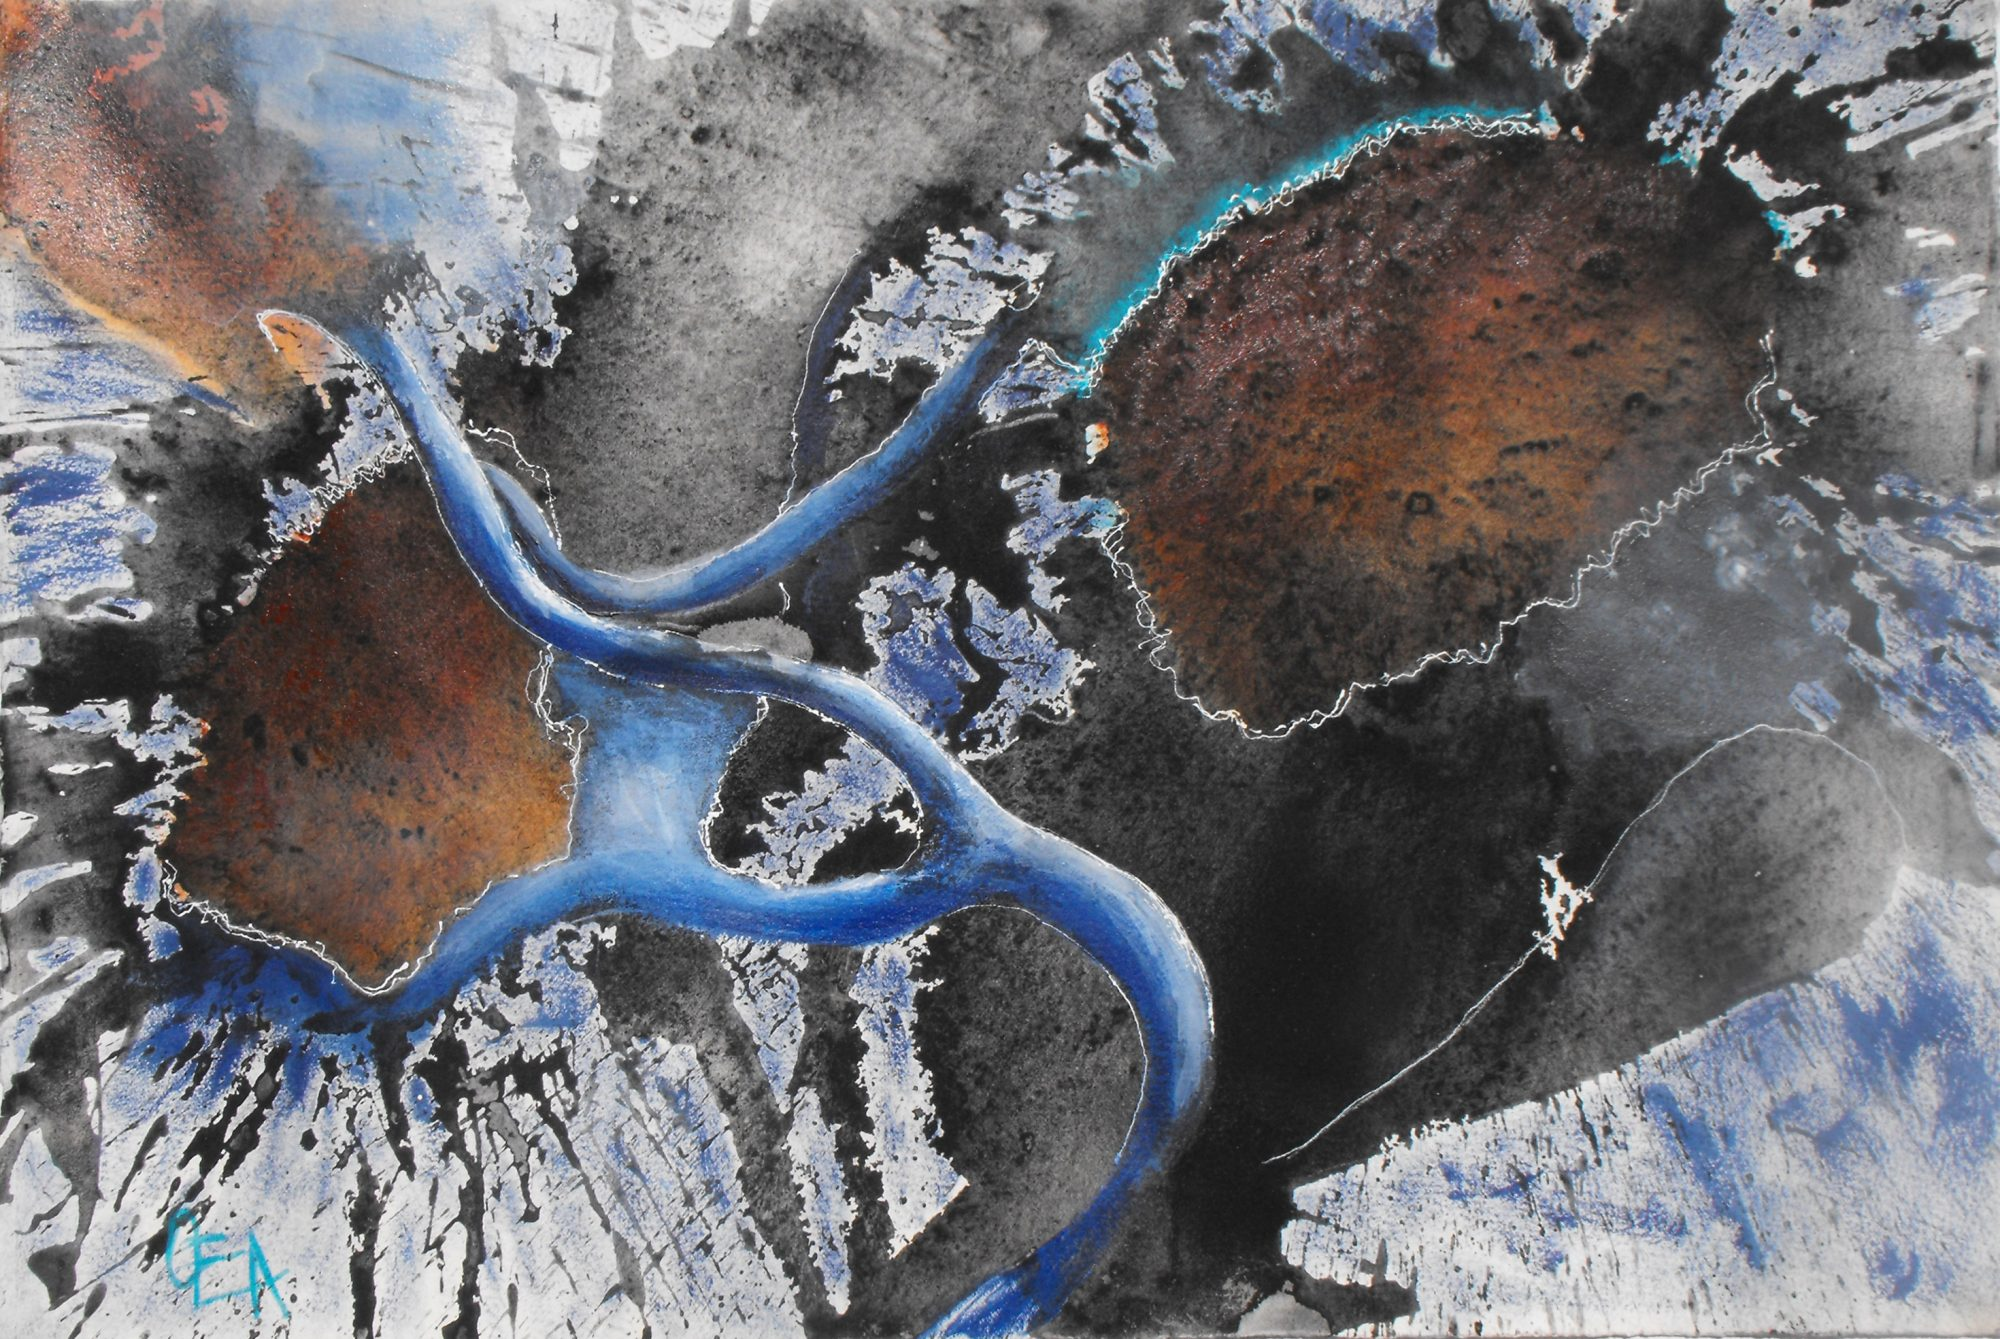 point-of-impact_blue-movement-orange-rhythm-line-charcoal-olivia-alexander